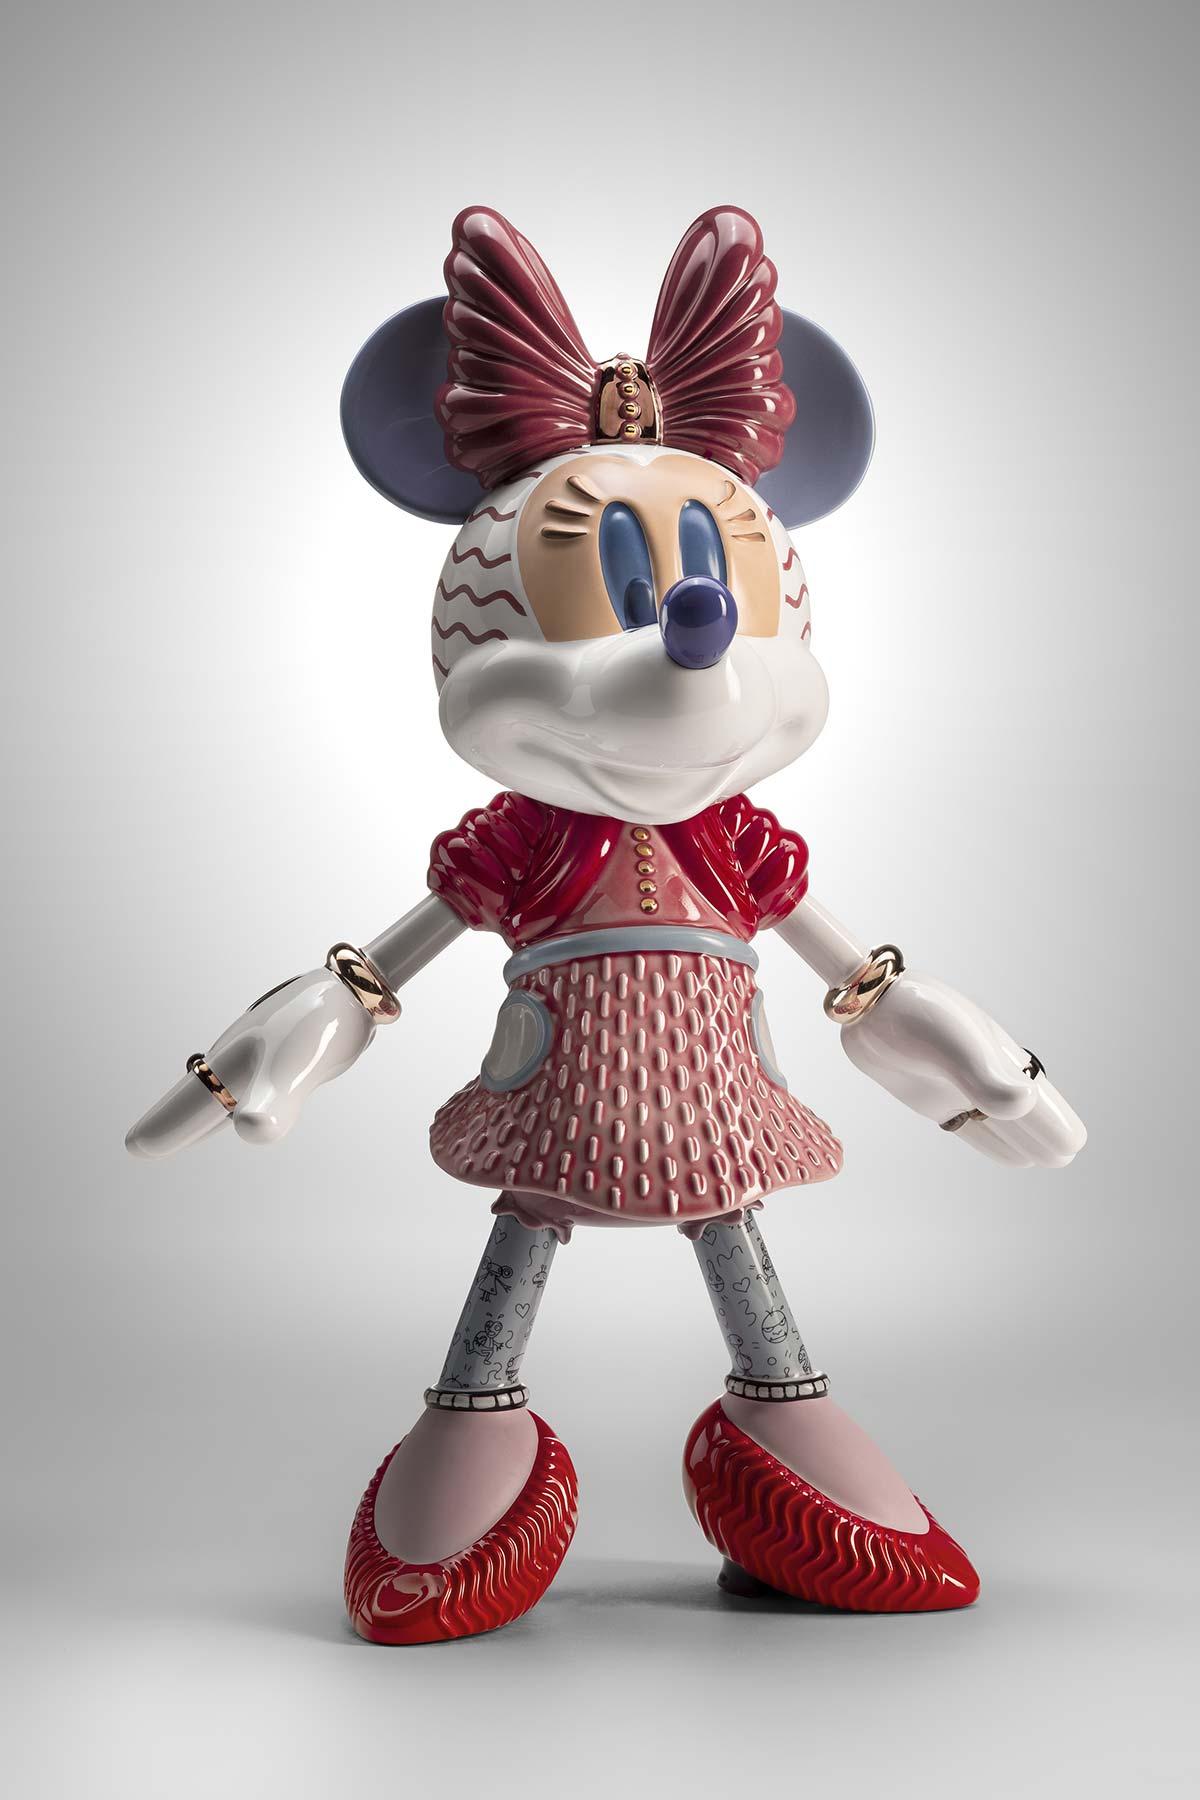 Minnie, Urban Minerva by Bosa, Design Elena Salmistraro - Photo © Riccardo Urnato